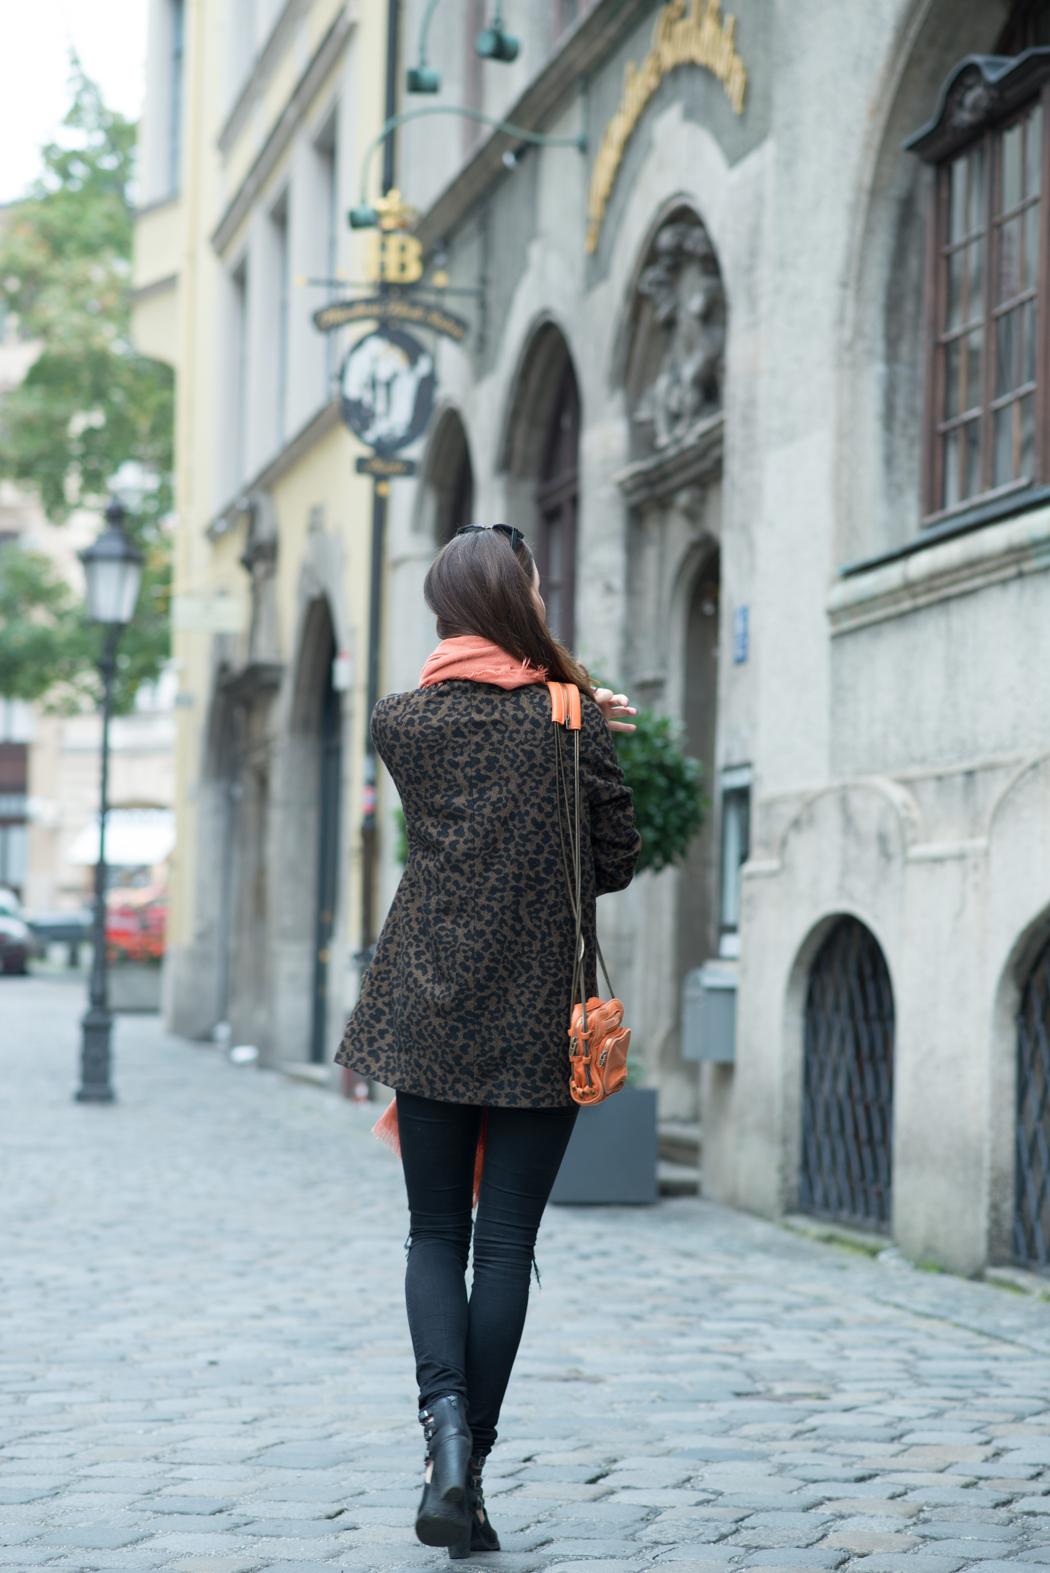 Münchner-Fashionblog-Alexander-Wang-Bag-Leomantel-3